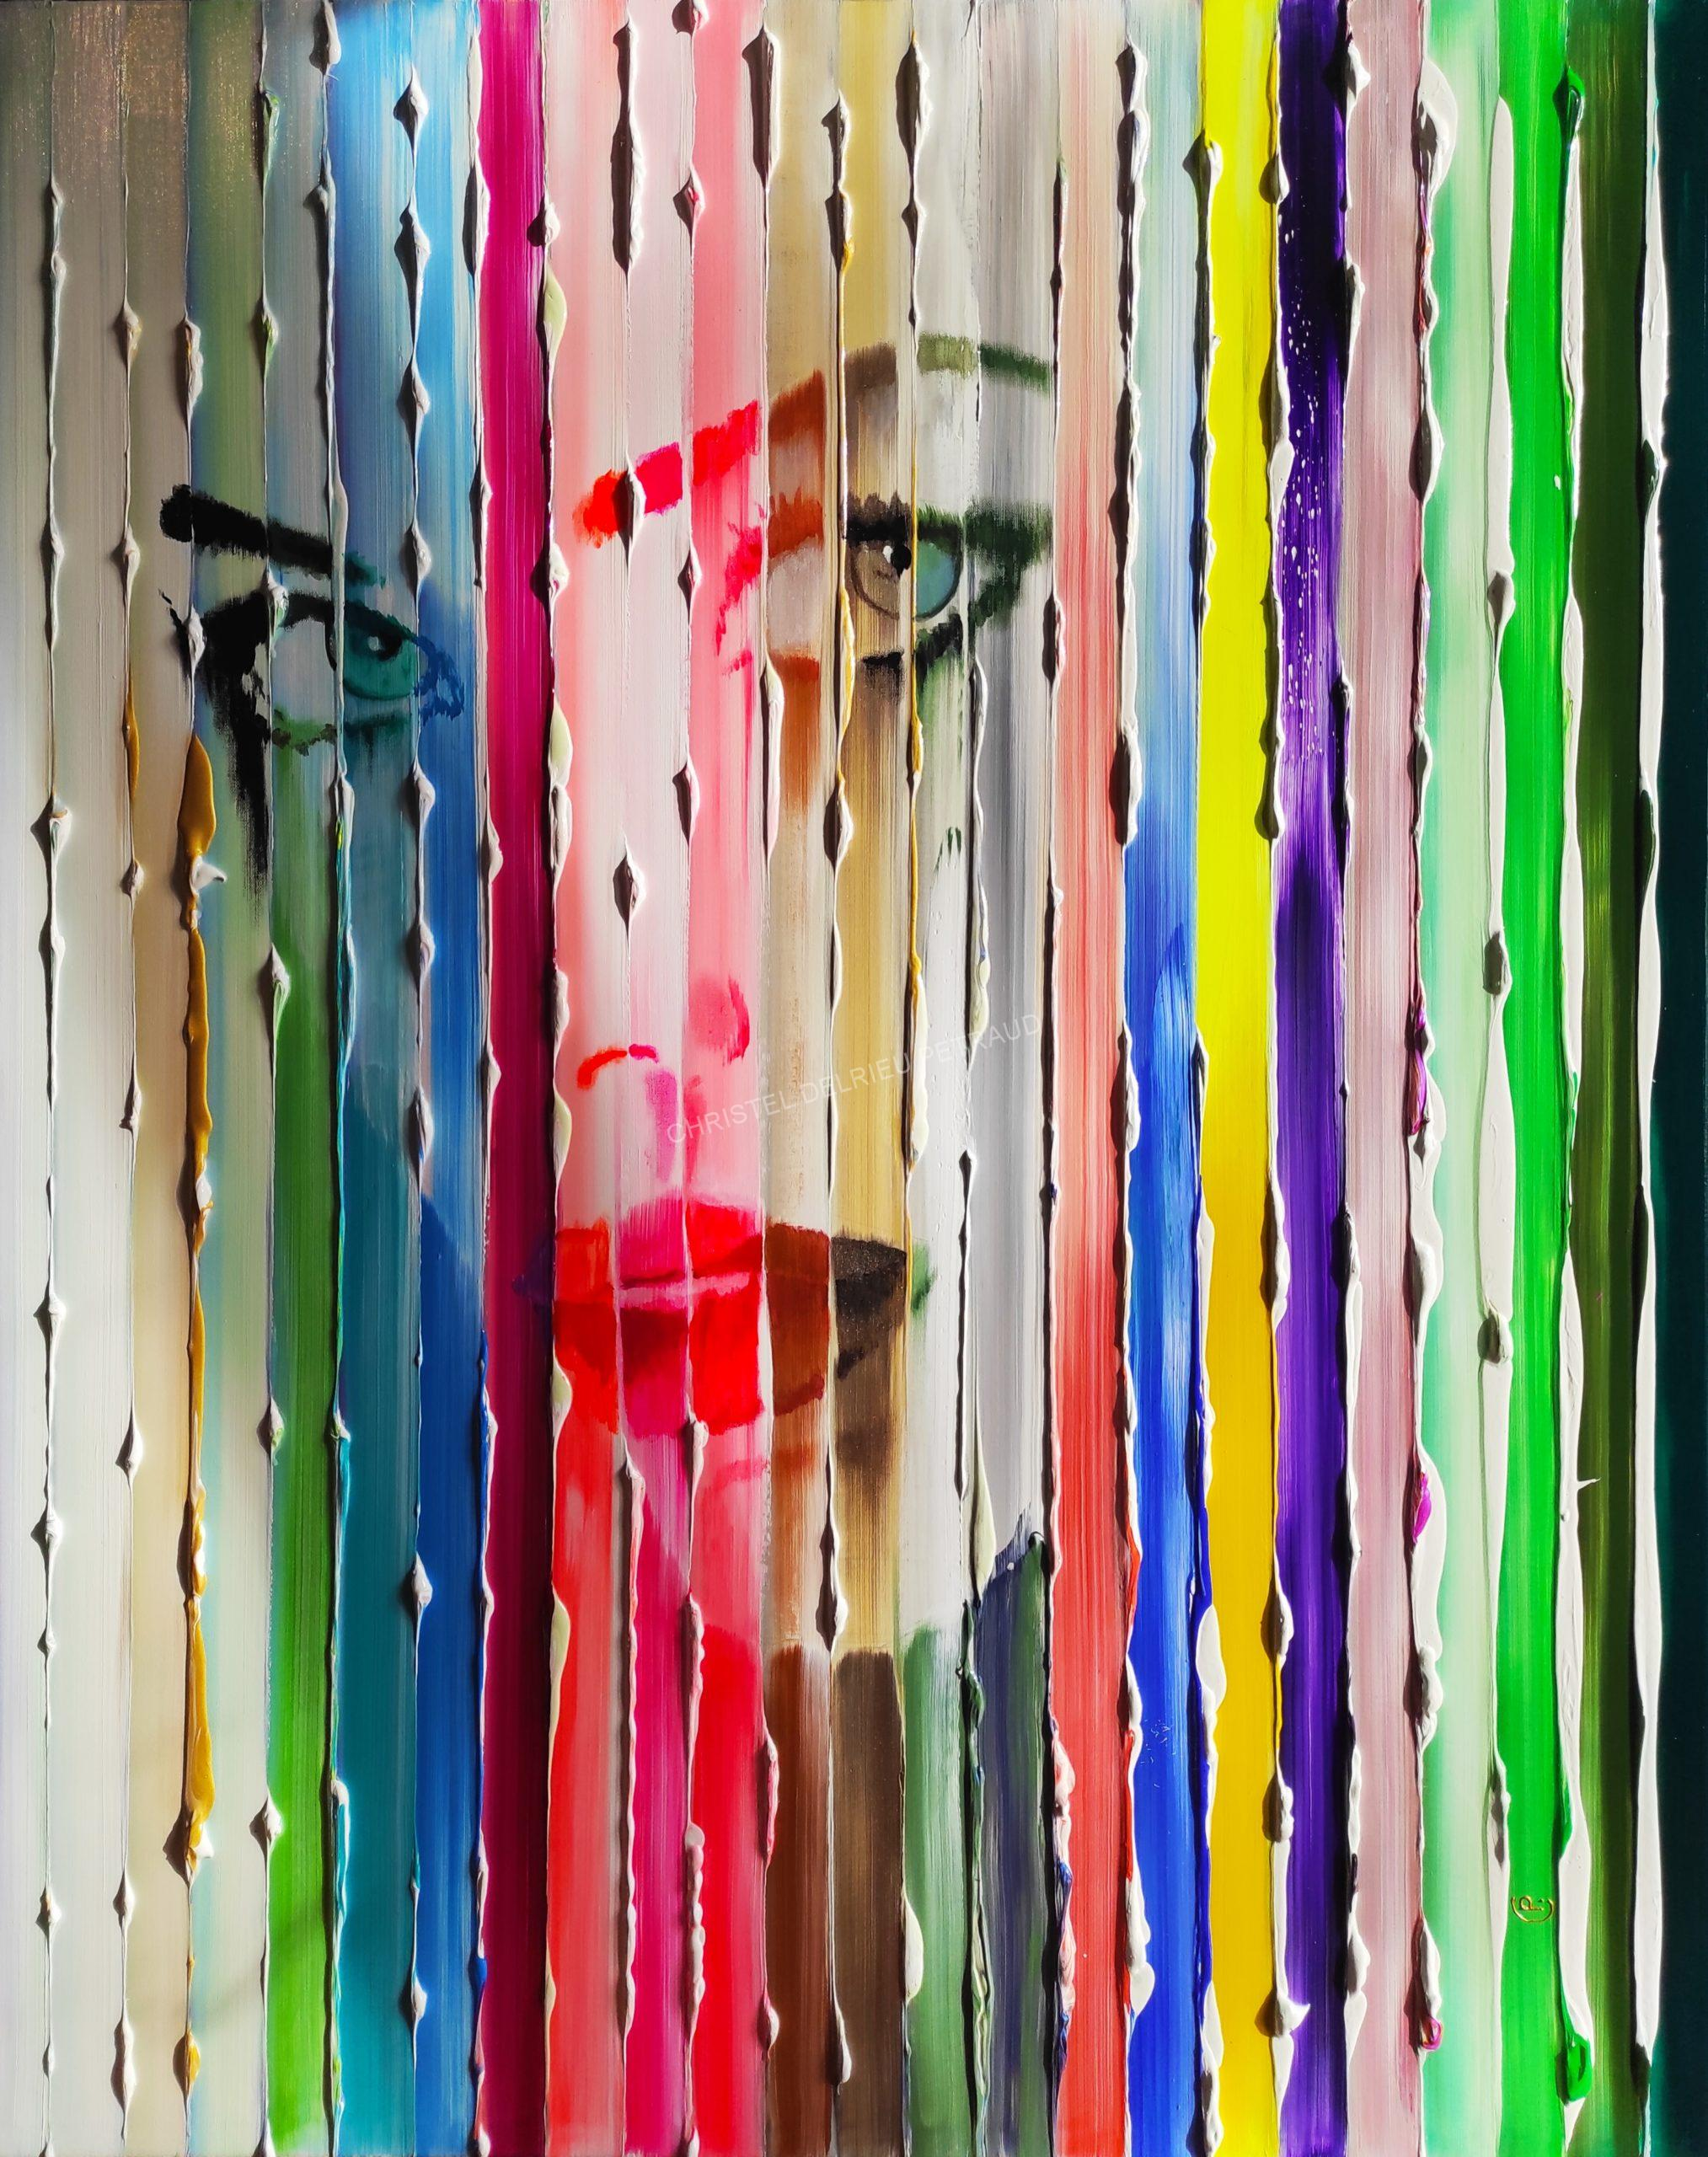 Artwork by Christel delrieu petraud